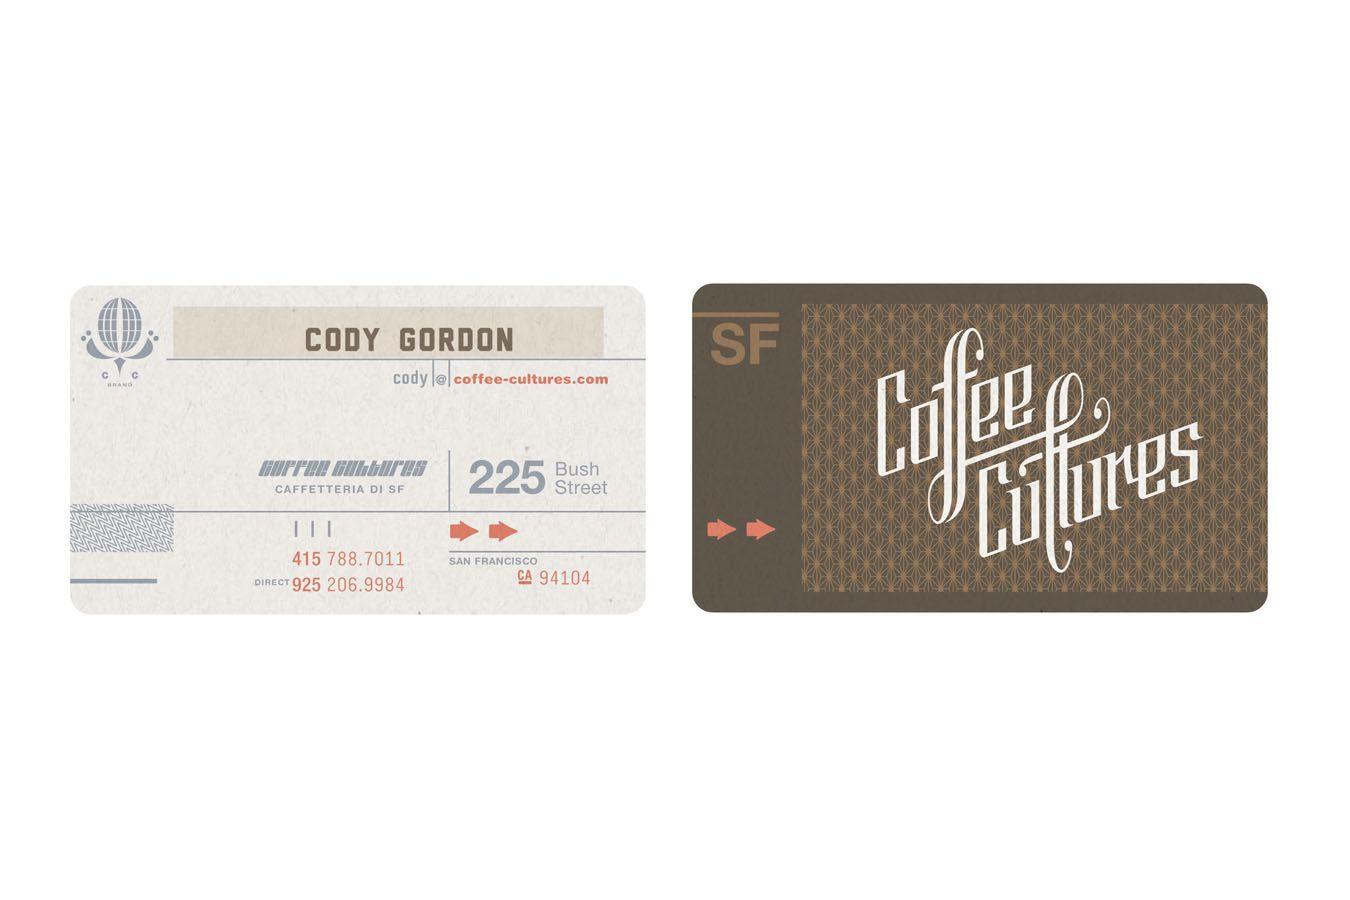 CC_business_card_r1